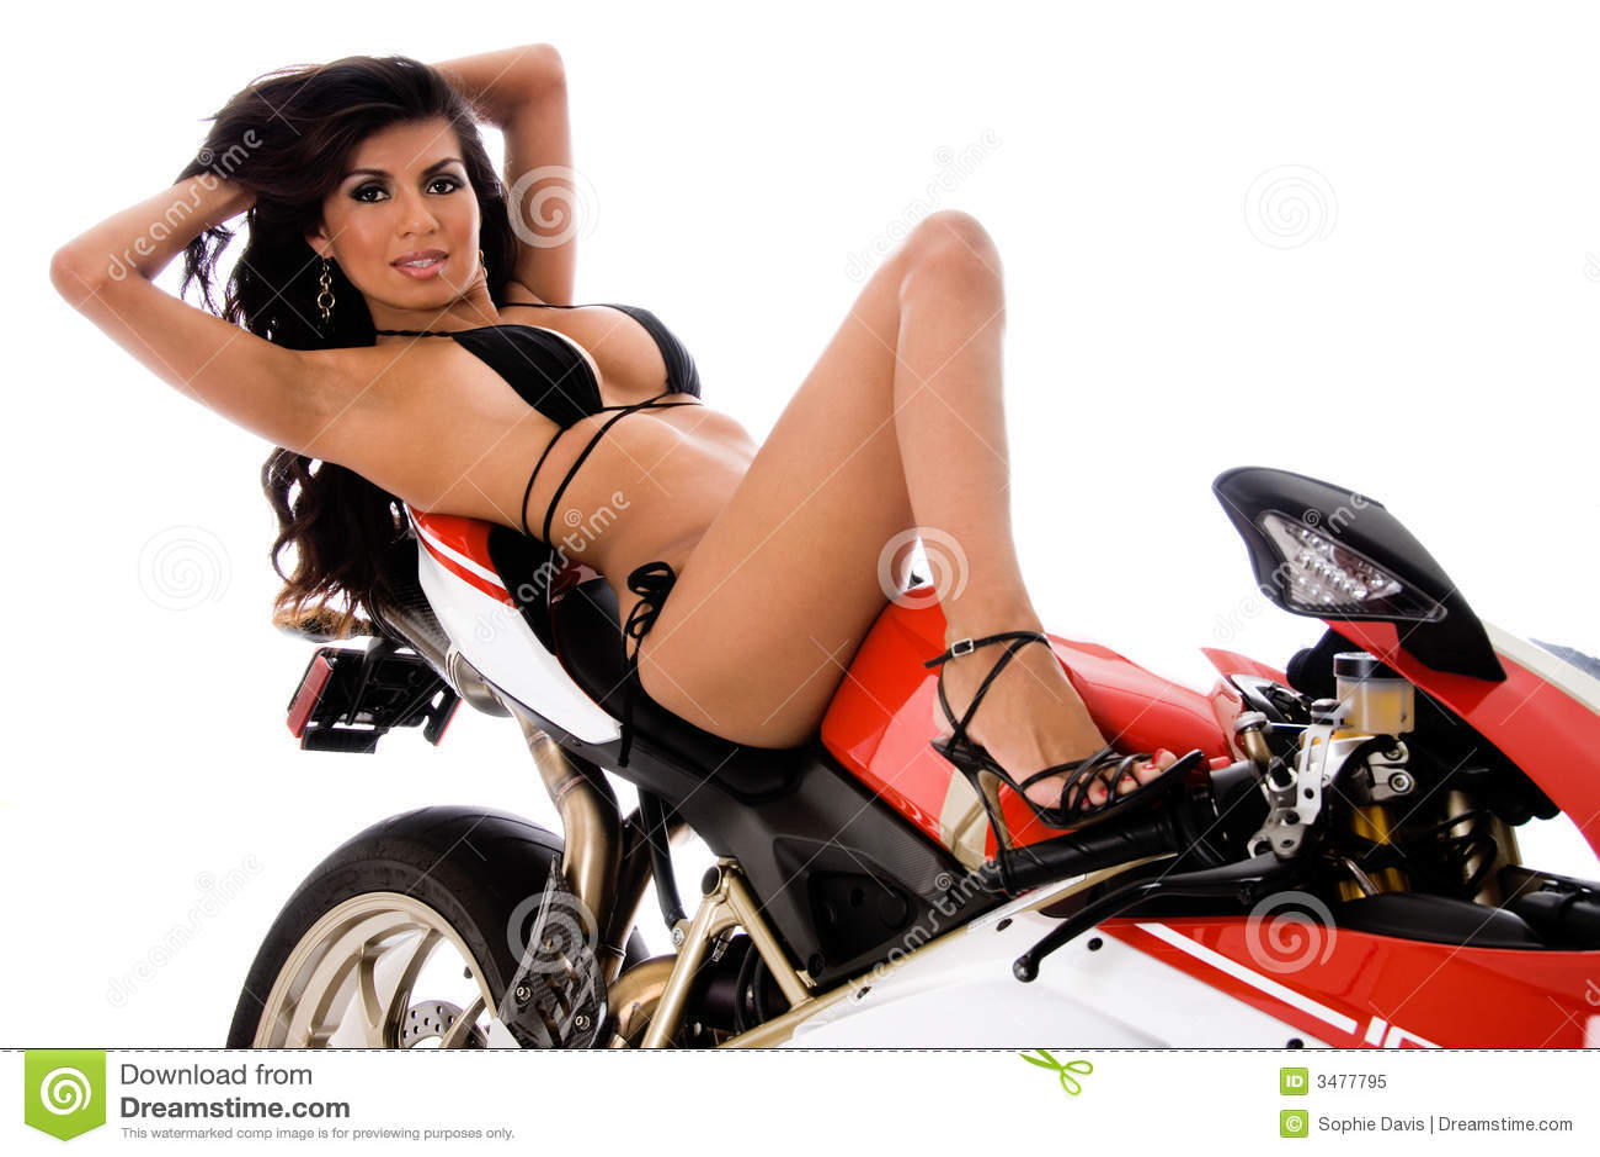 Biker chicks bikinis